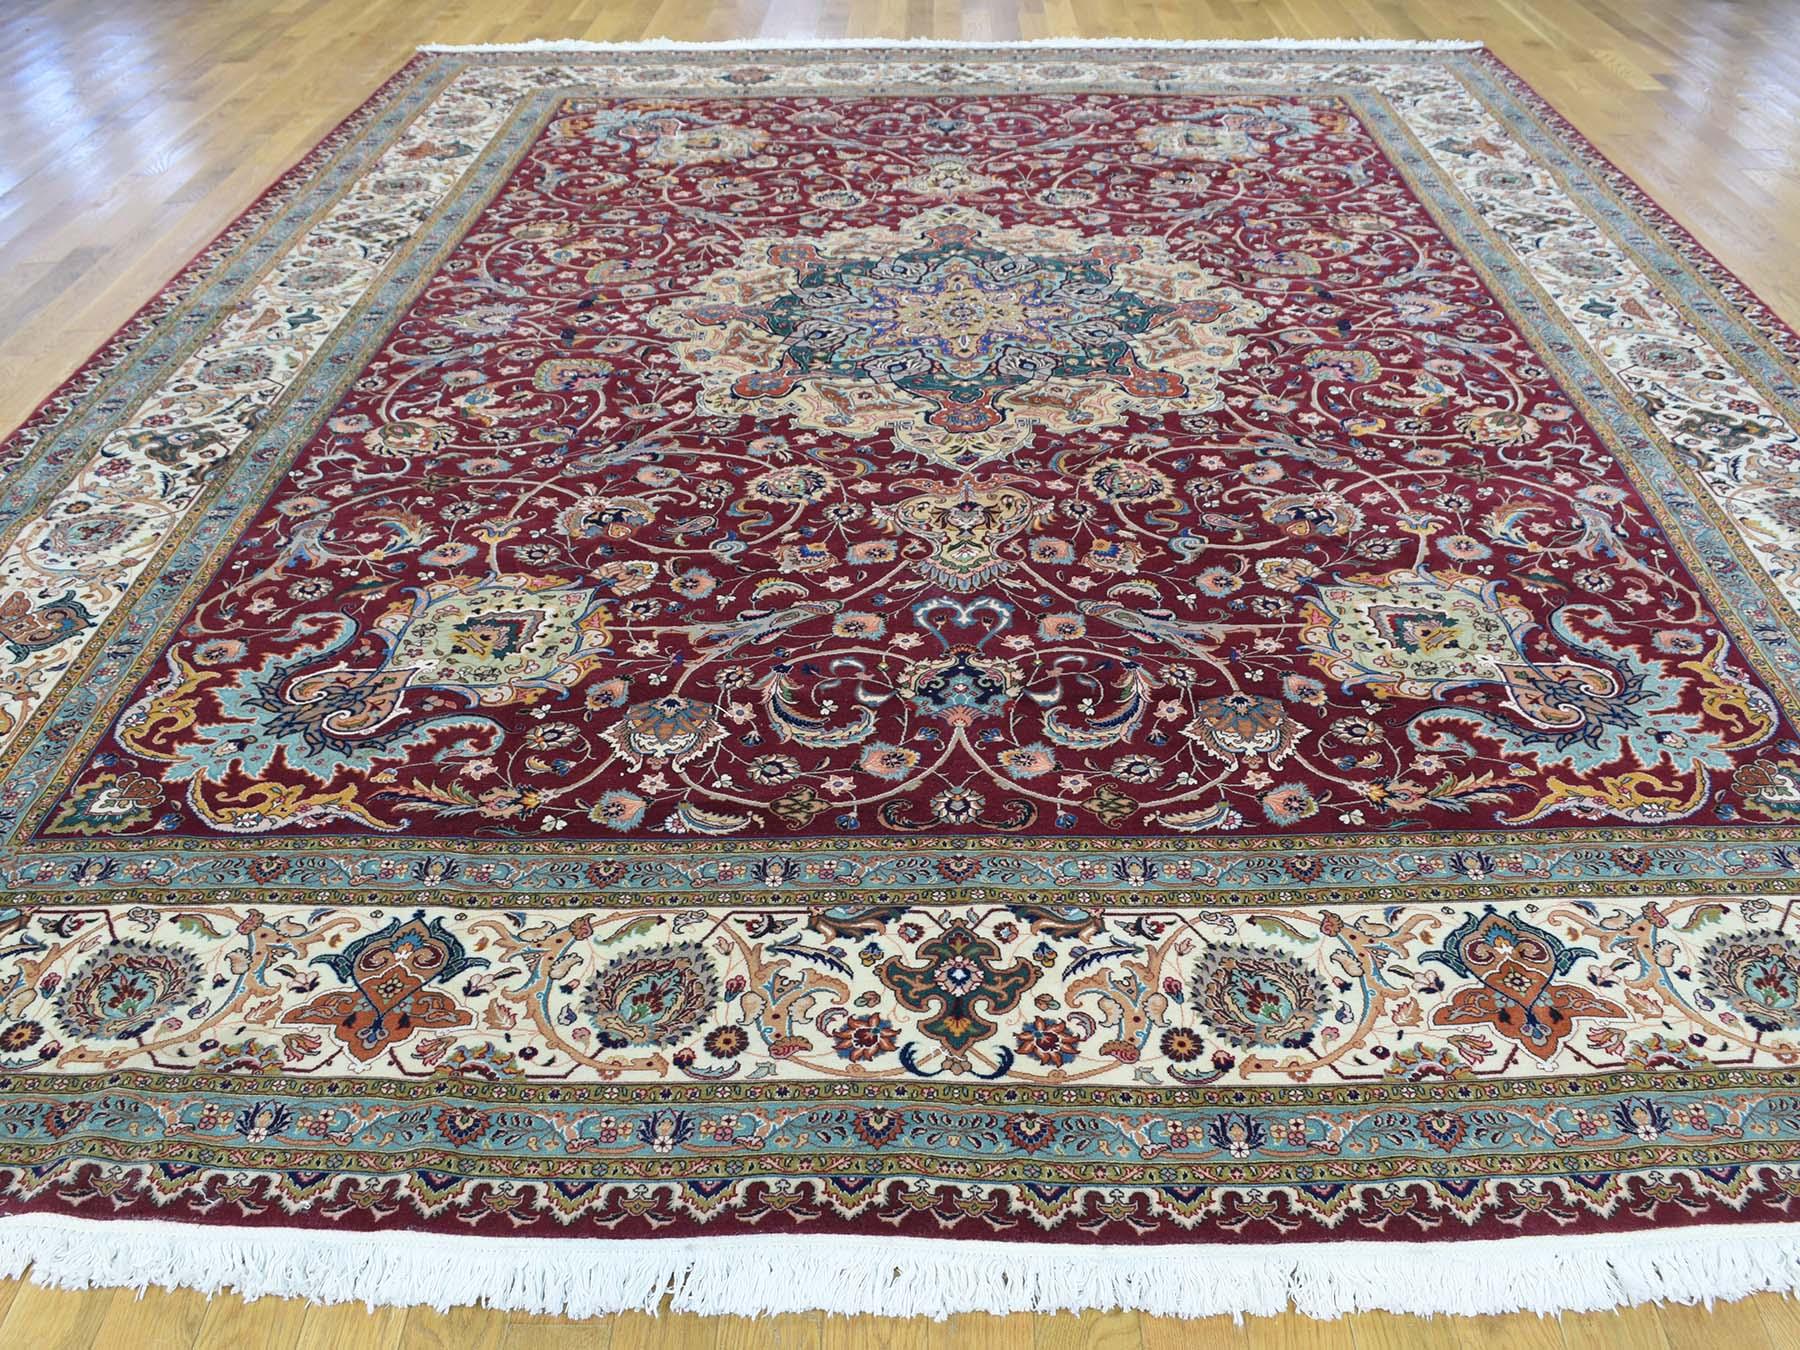 9-9 x12-8  Persian Tabriz 400 Kpsi Wool and Silk Handmade Oriental Rug